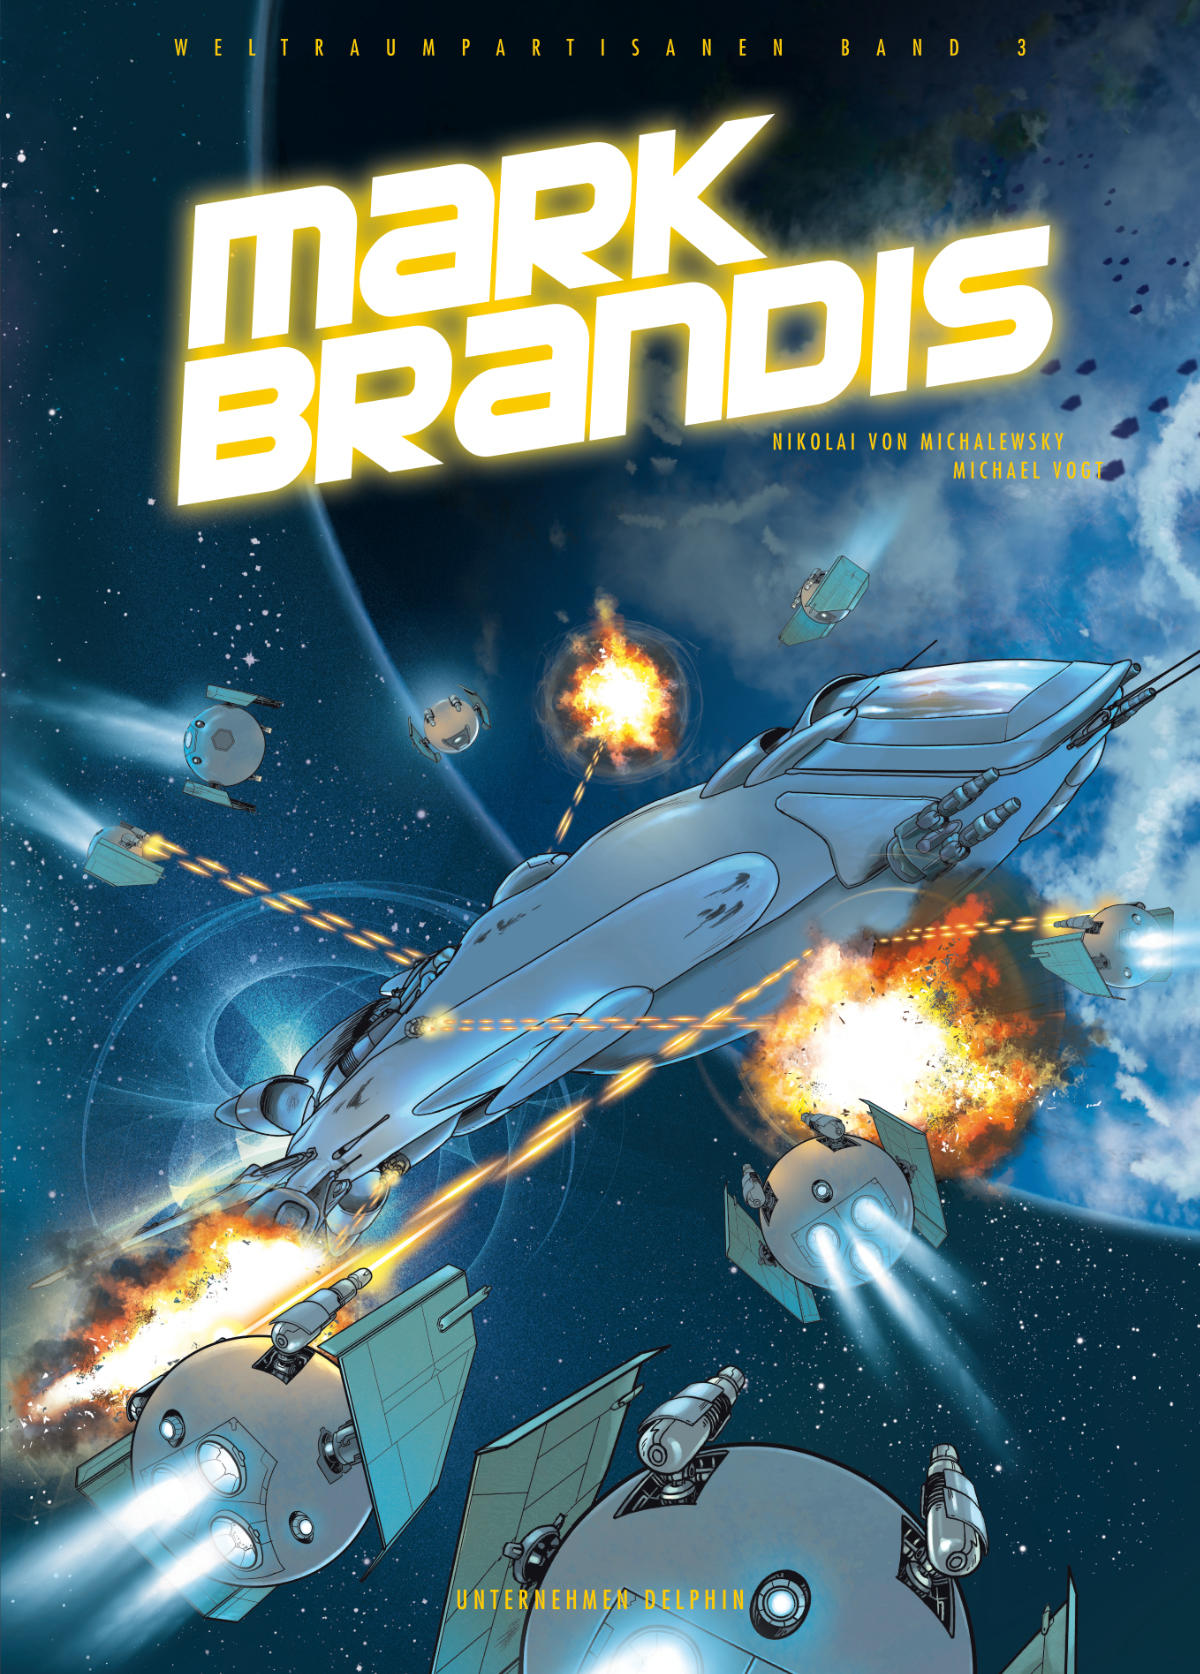 Mark Brandis Unternehmen Delphin cover by MichaelVogt